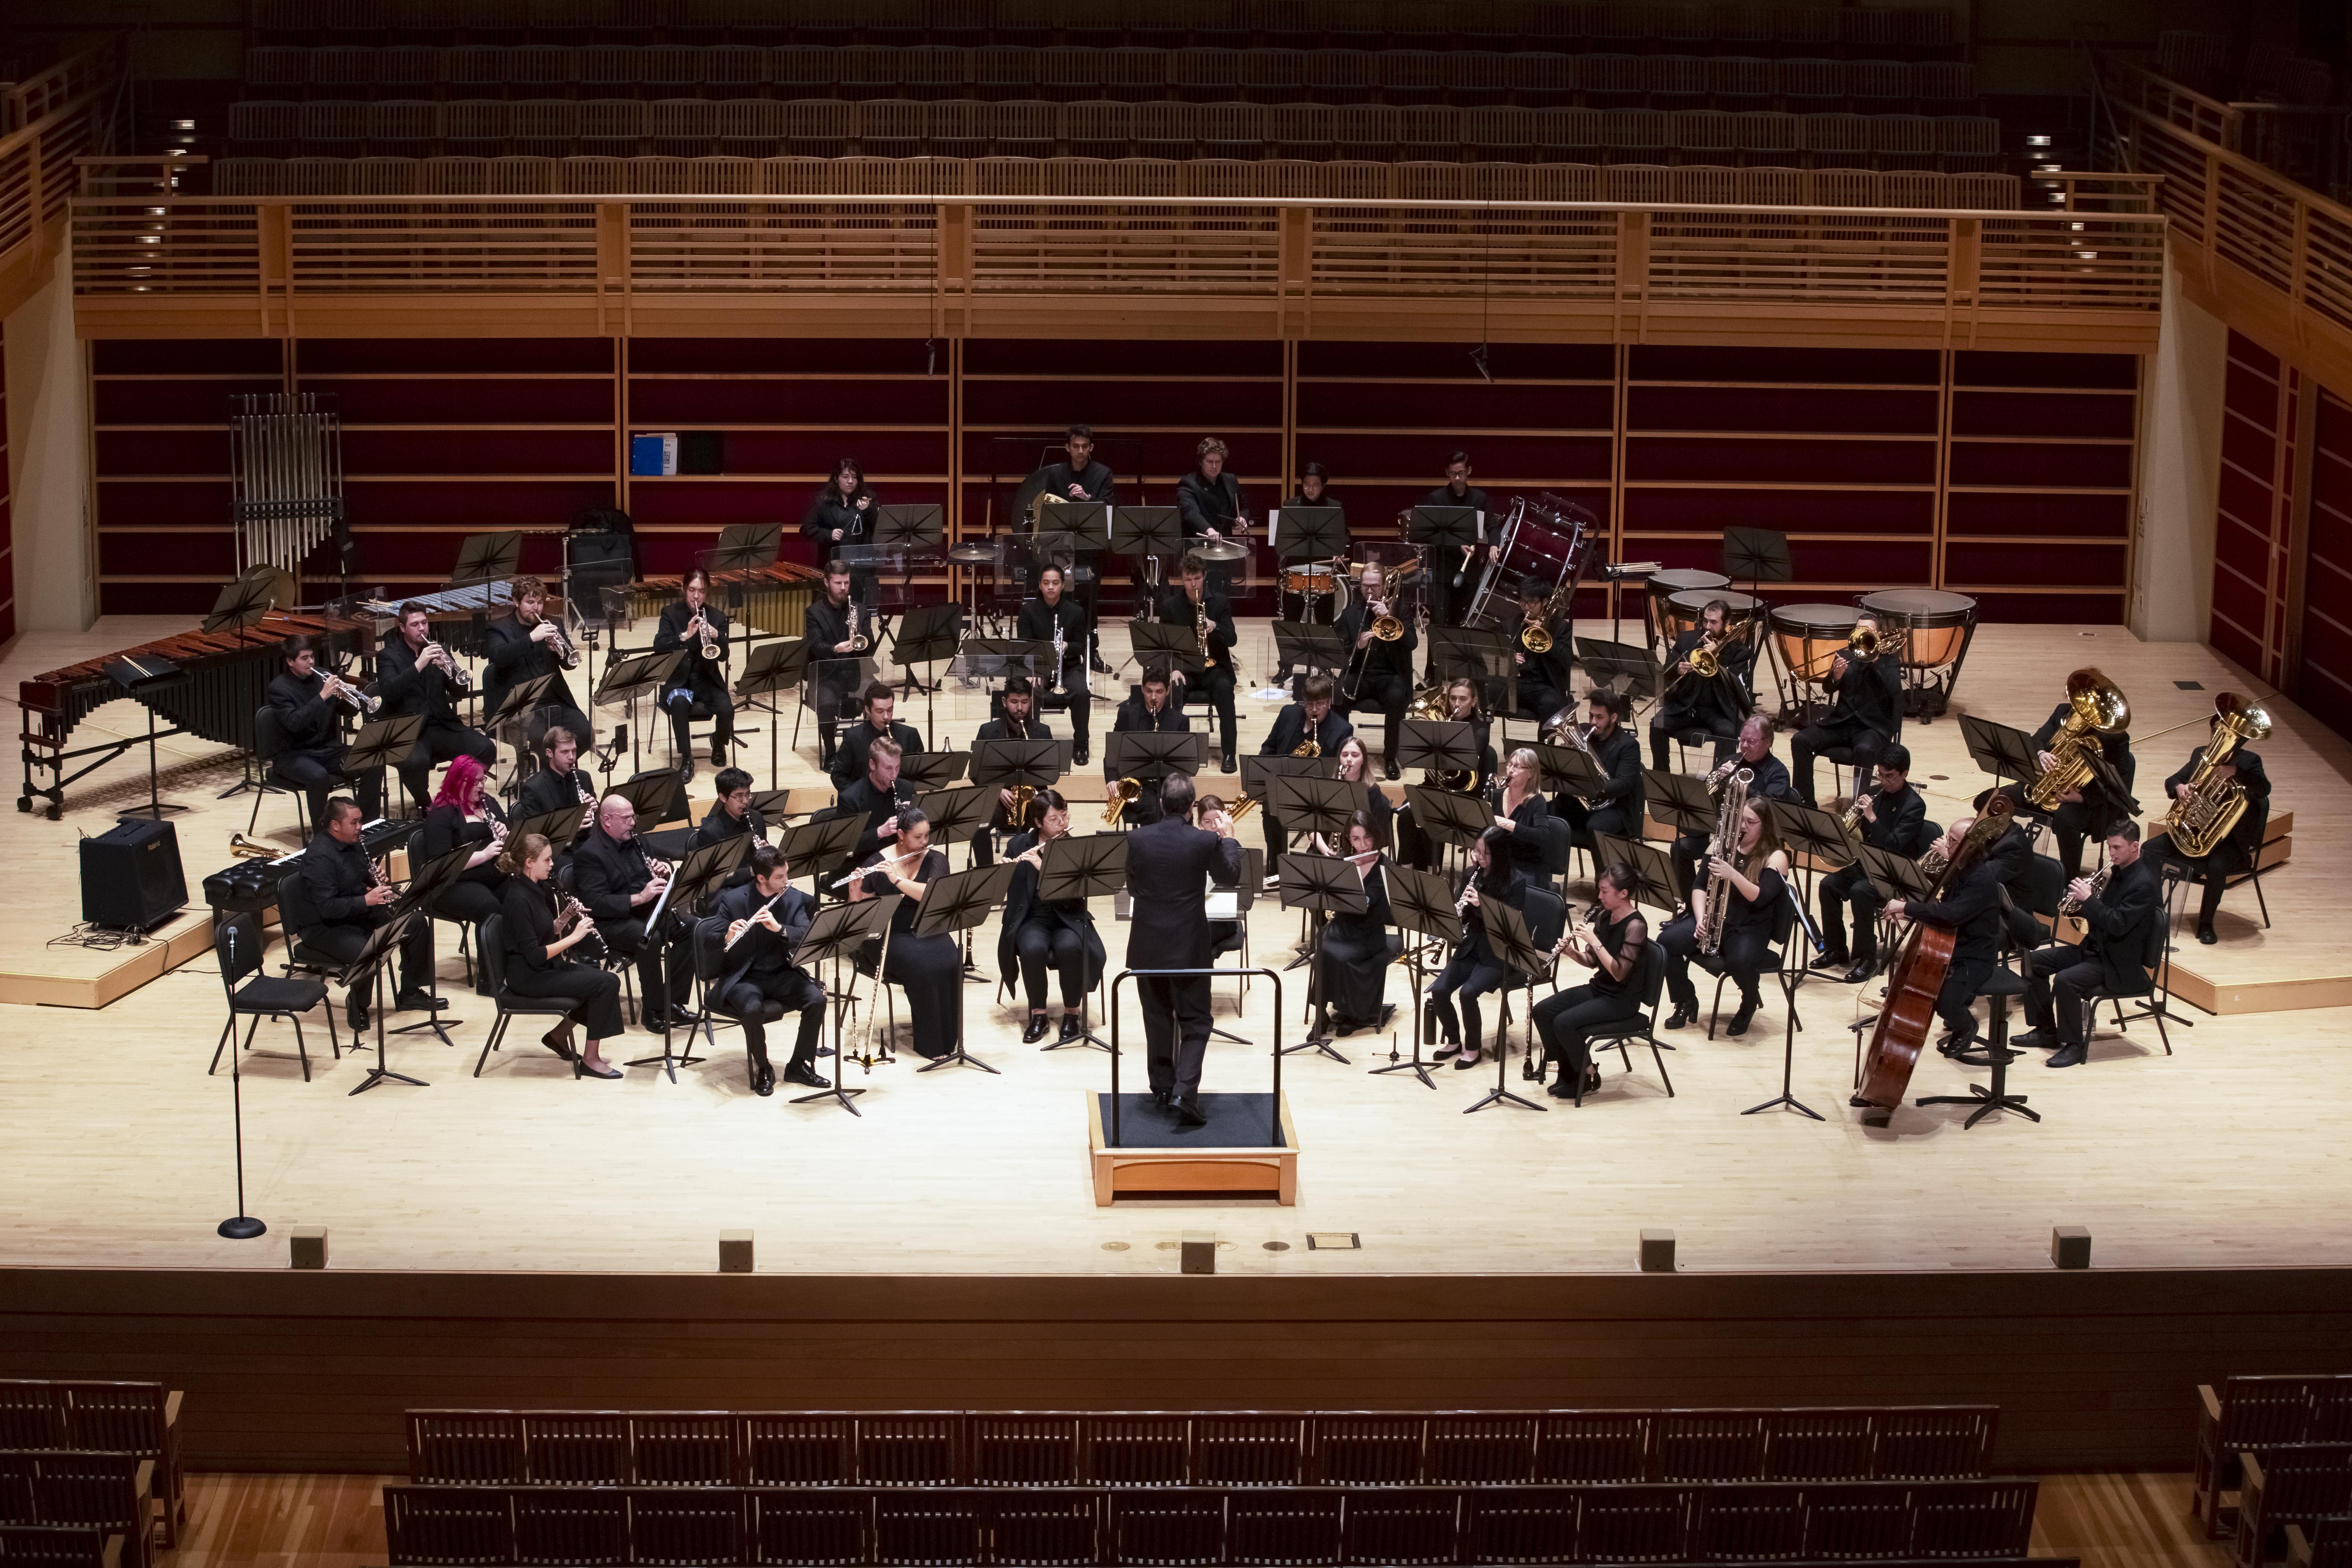 Symphonic Wind Ensemble on stage